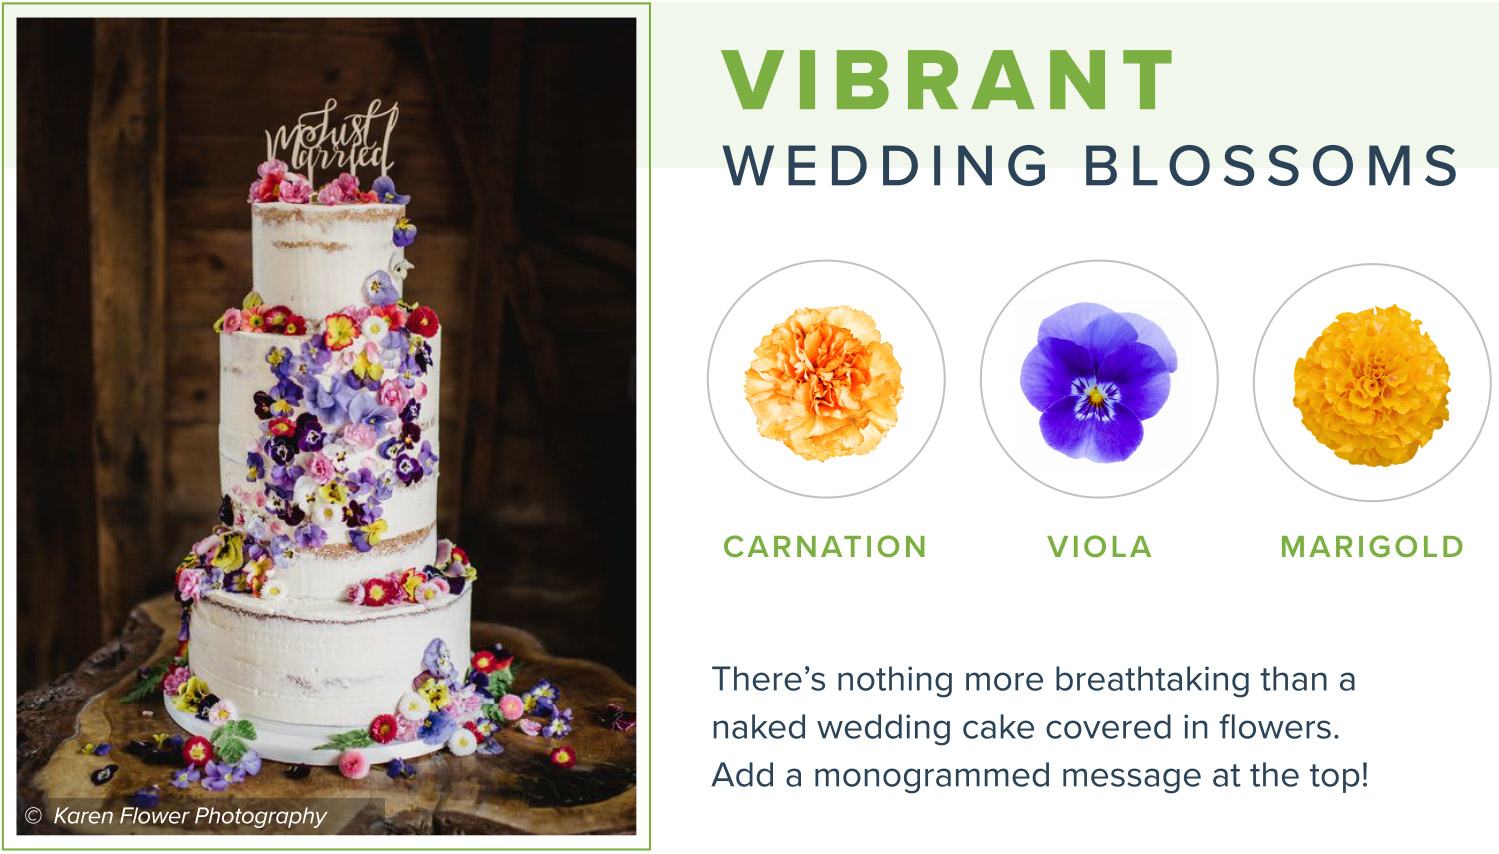 edible flowers vibrant wedding blossom